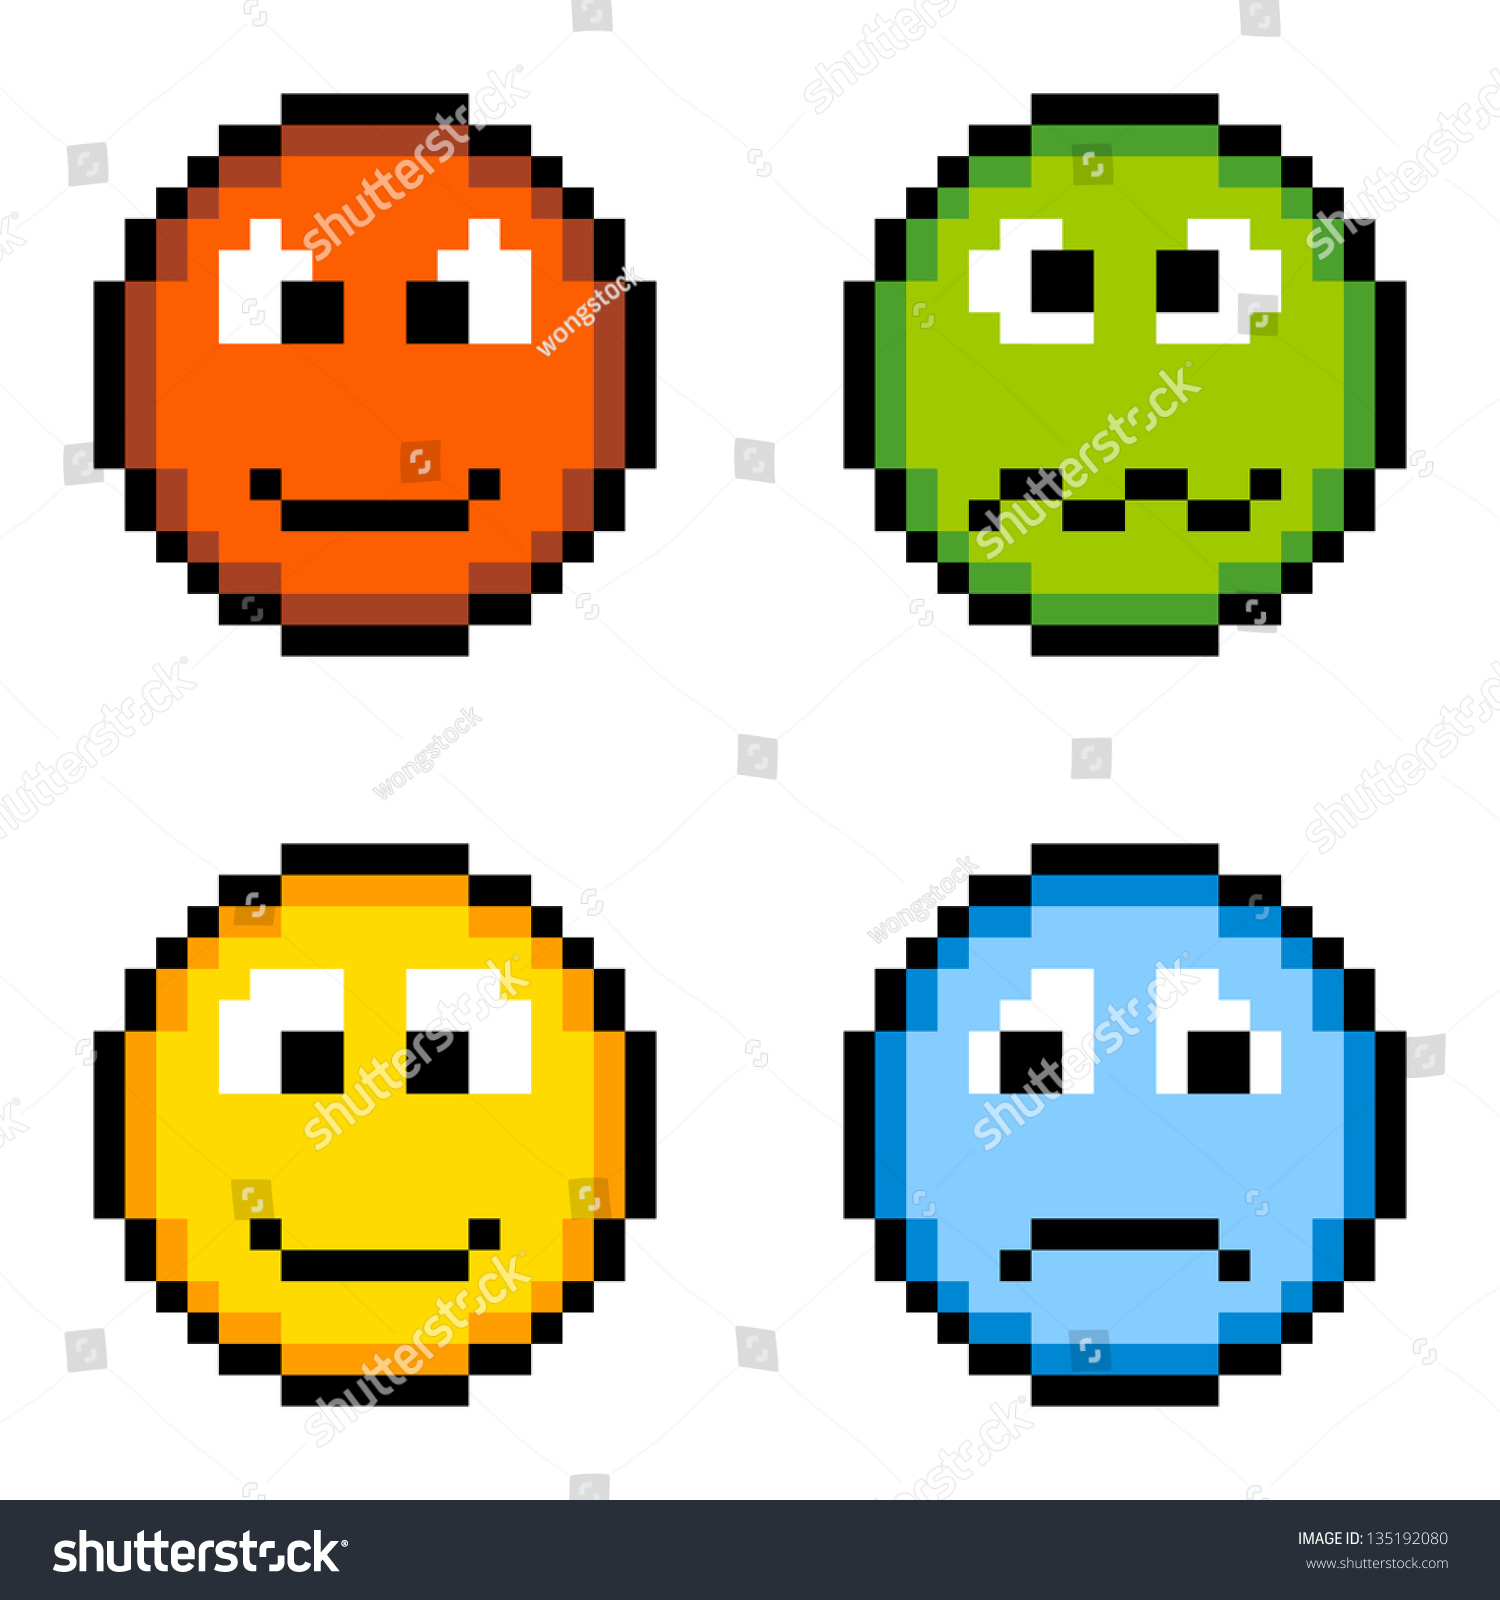 8-Bit Pixel Emoji Icons: Angry, Sick, Happy, Sad Stock